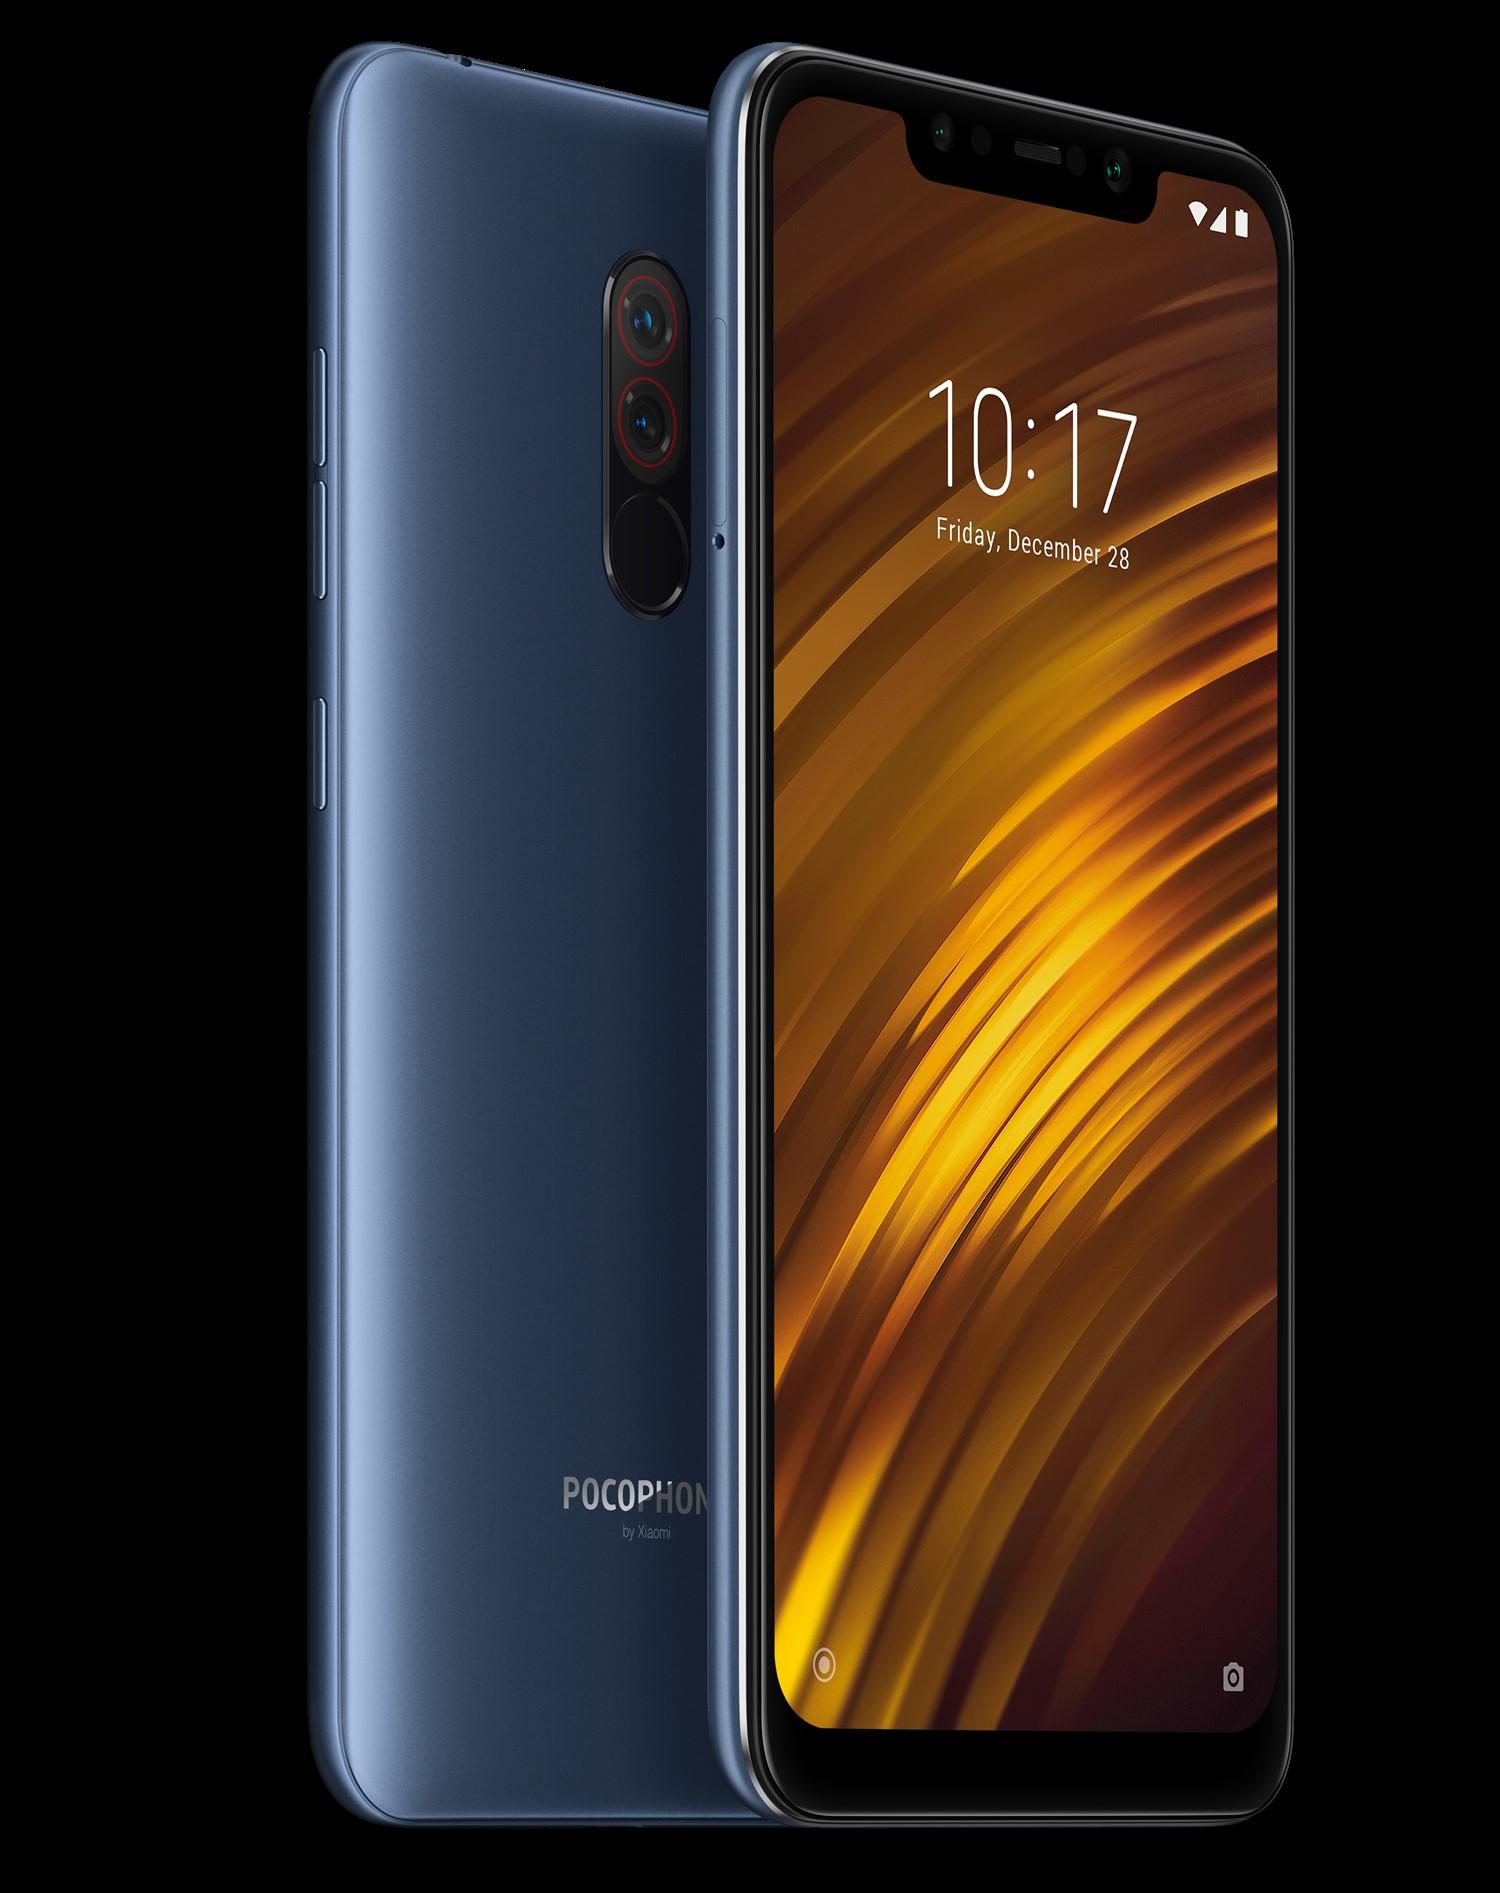 poco-f1-mobile-phone